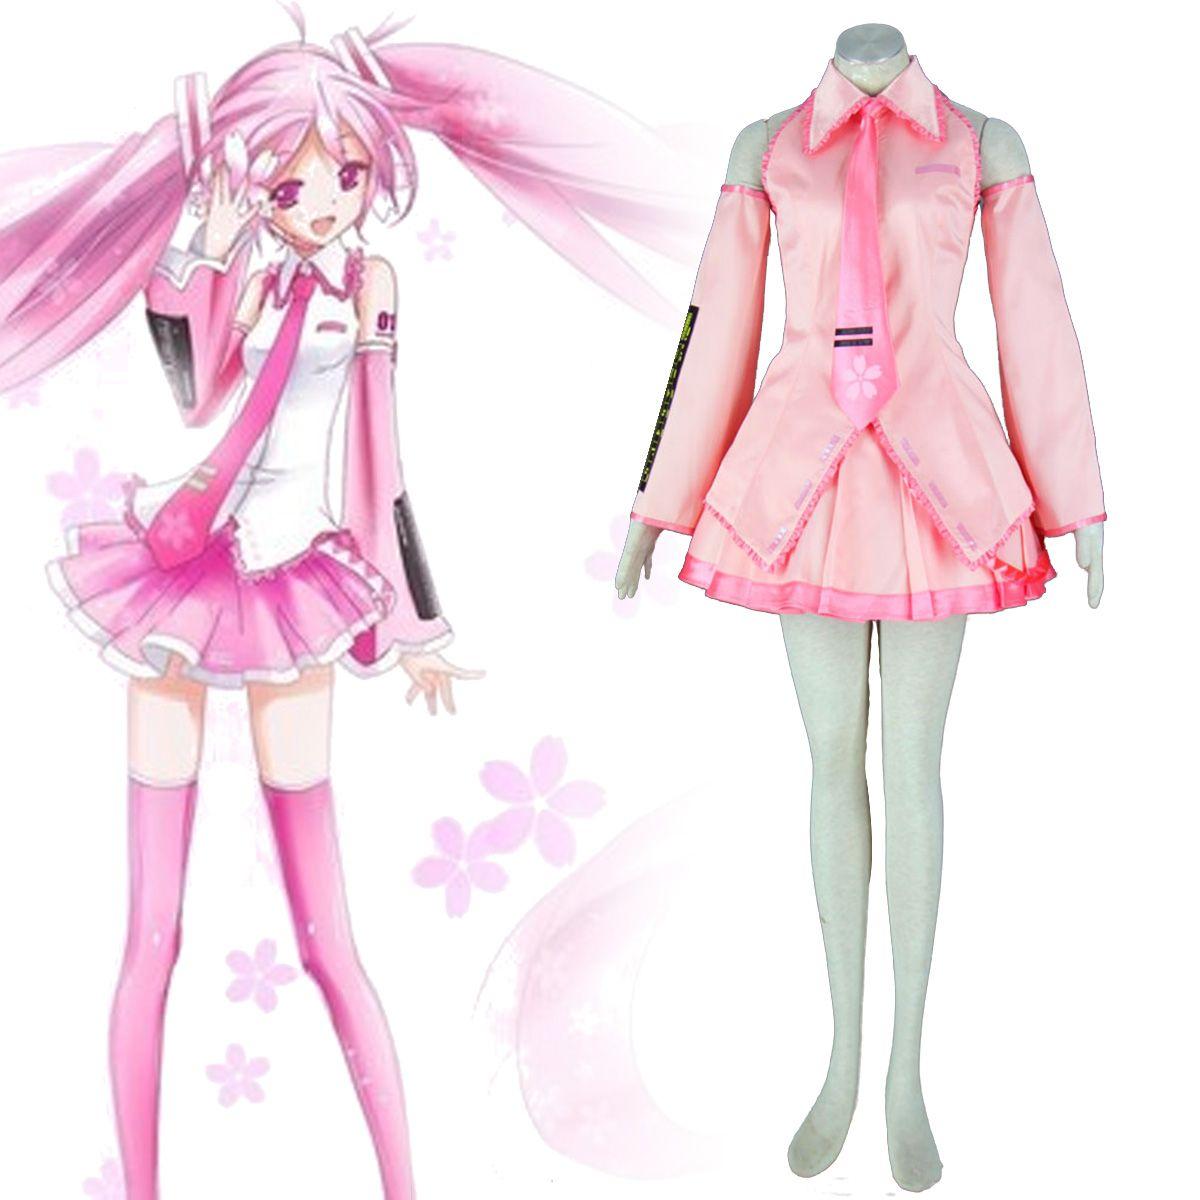 Deluxe Vocaloid Sakura Hatsune Miku 1ST Cosplay Costumes